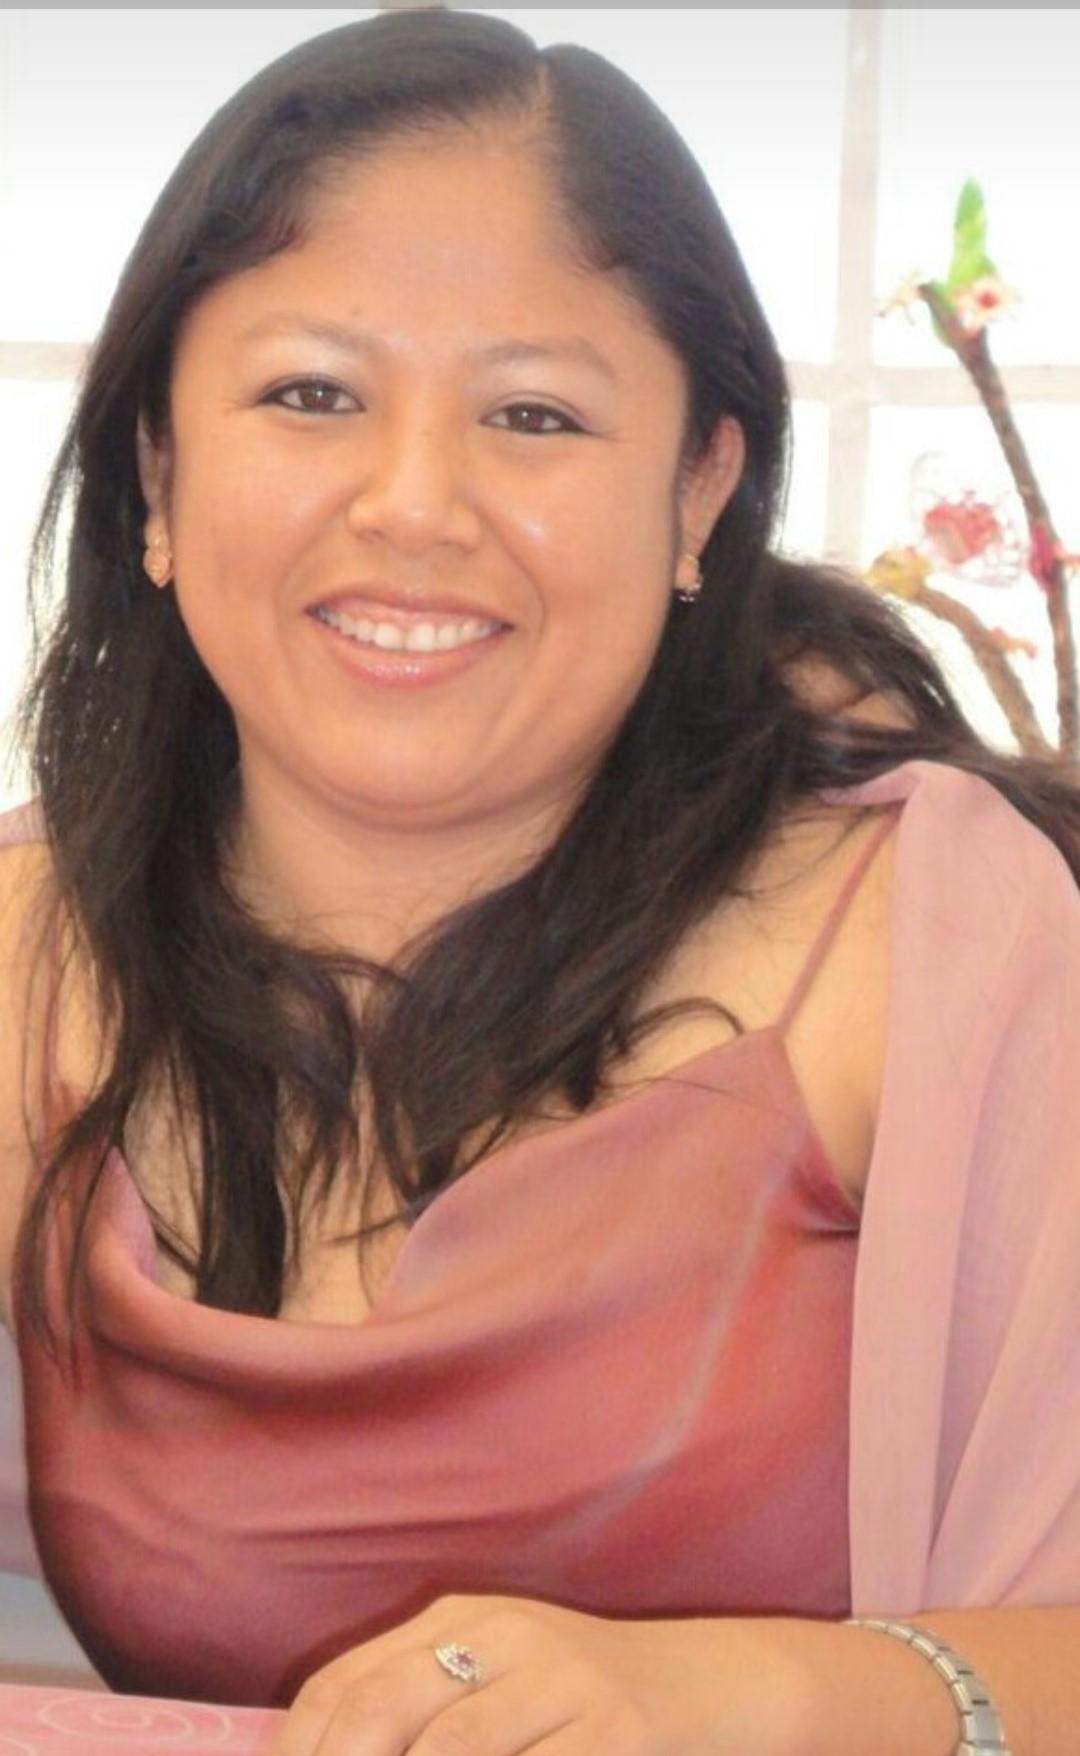 Permanece impune crimen de Paola Cecilia Rocha Viveros